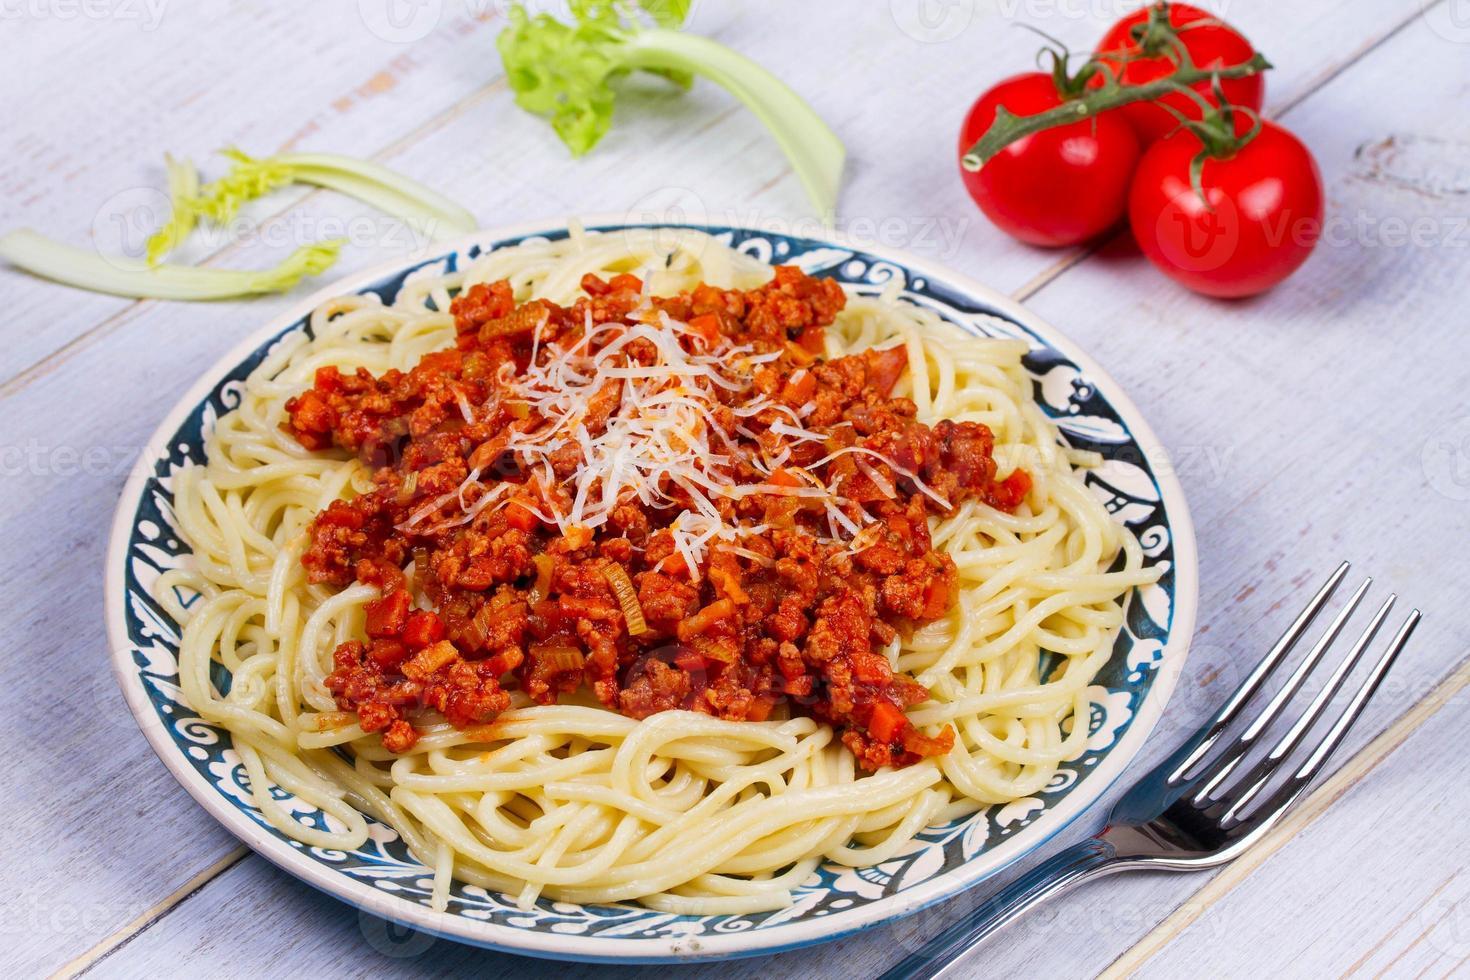 spaghetti à la sauce bolognaise photo